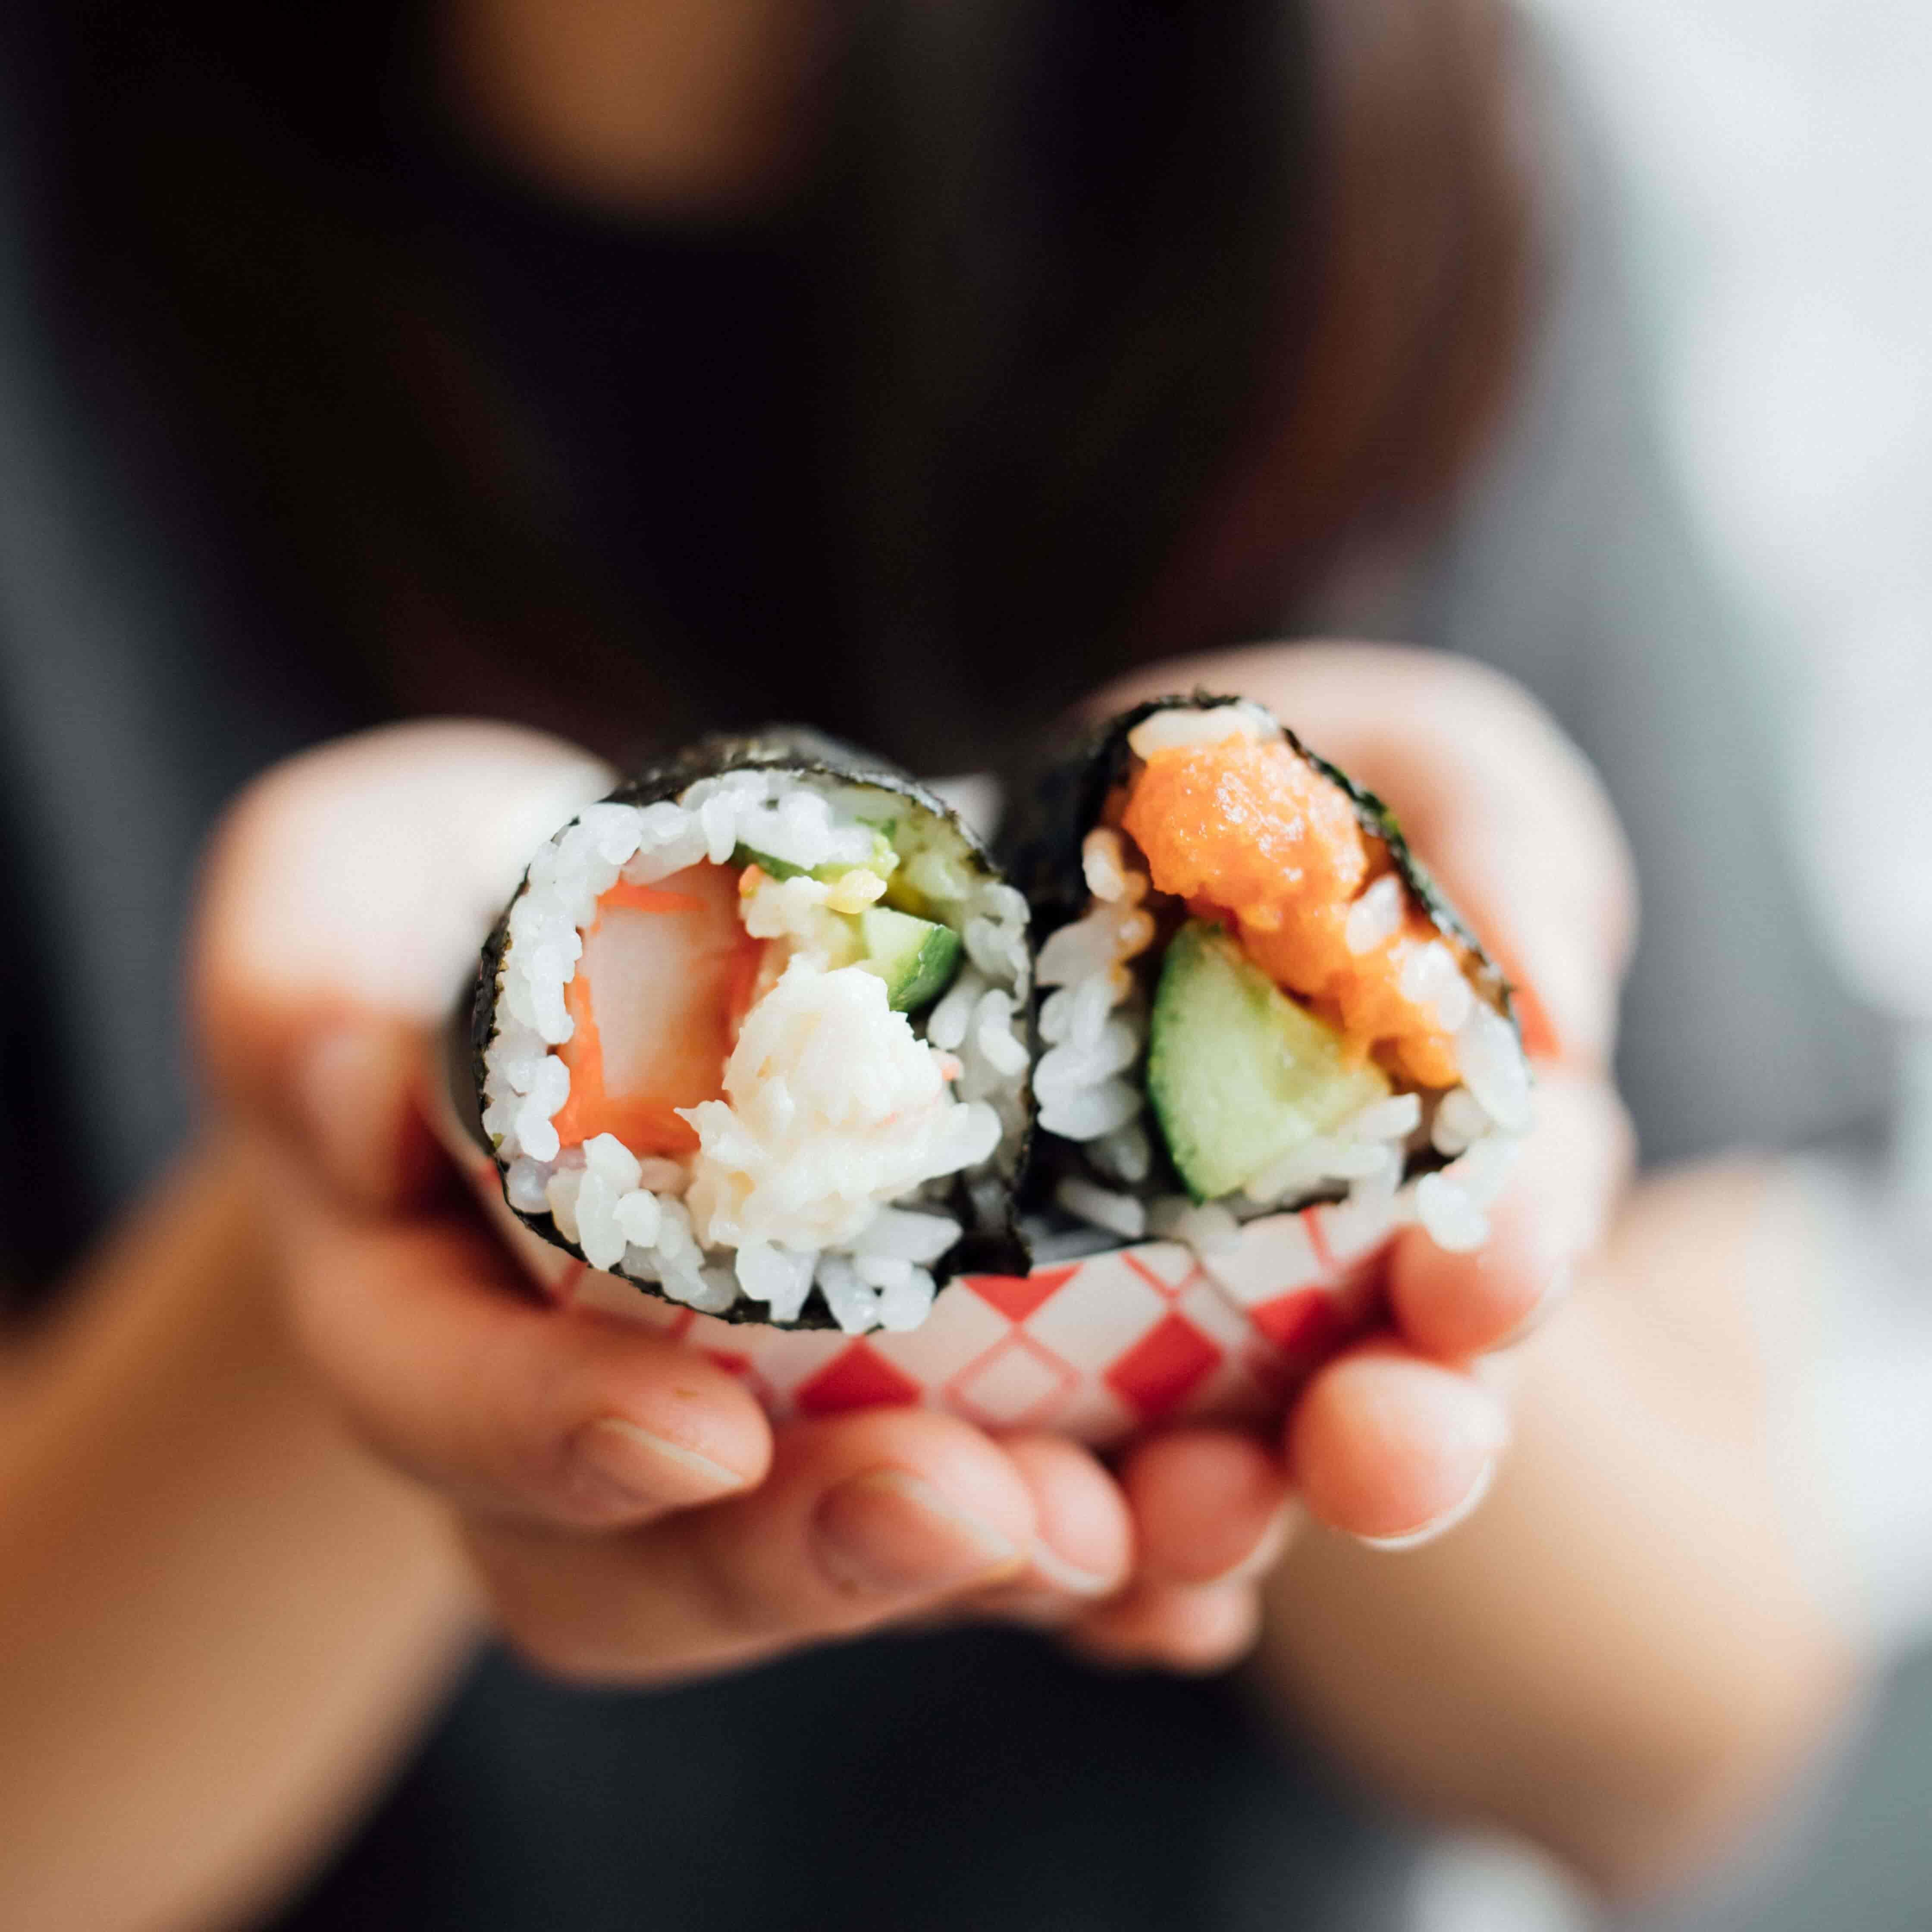 Date Night: Sushi Basics for Couples